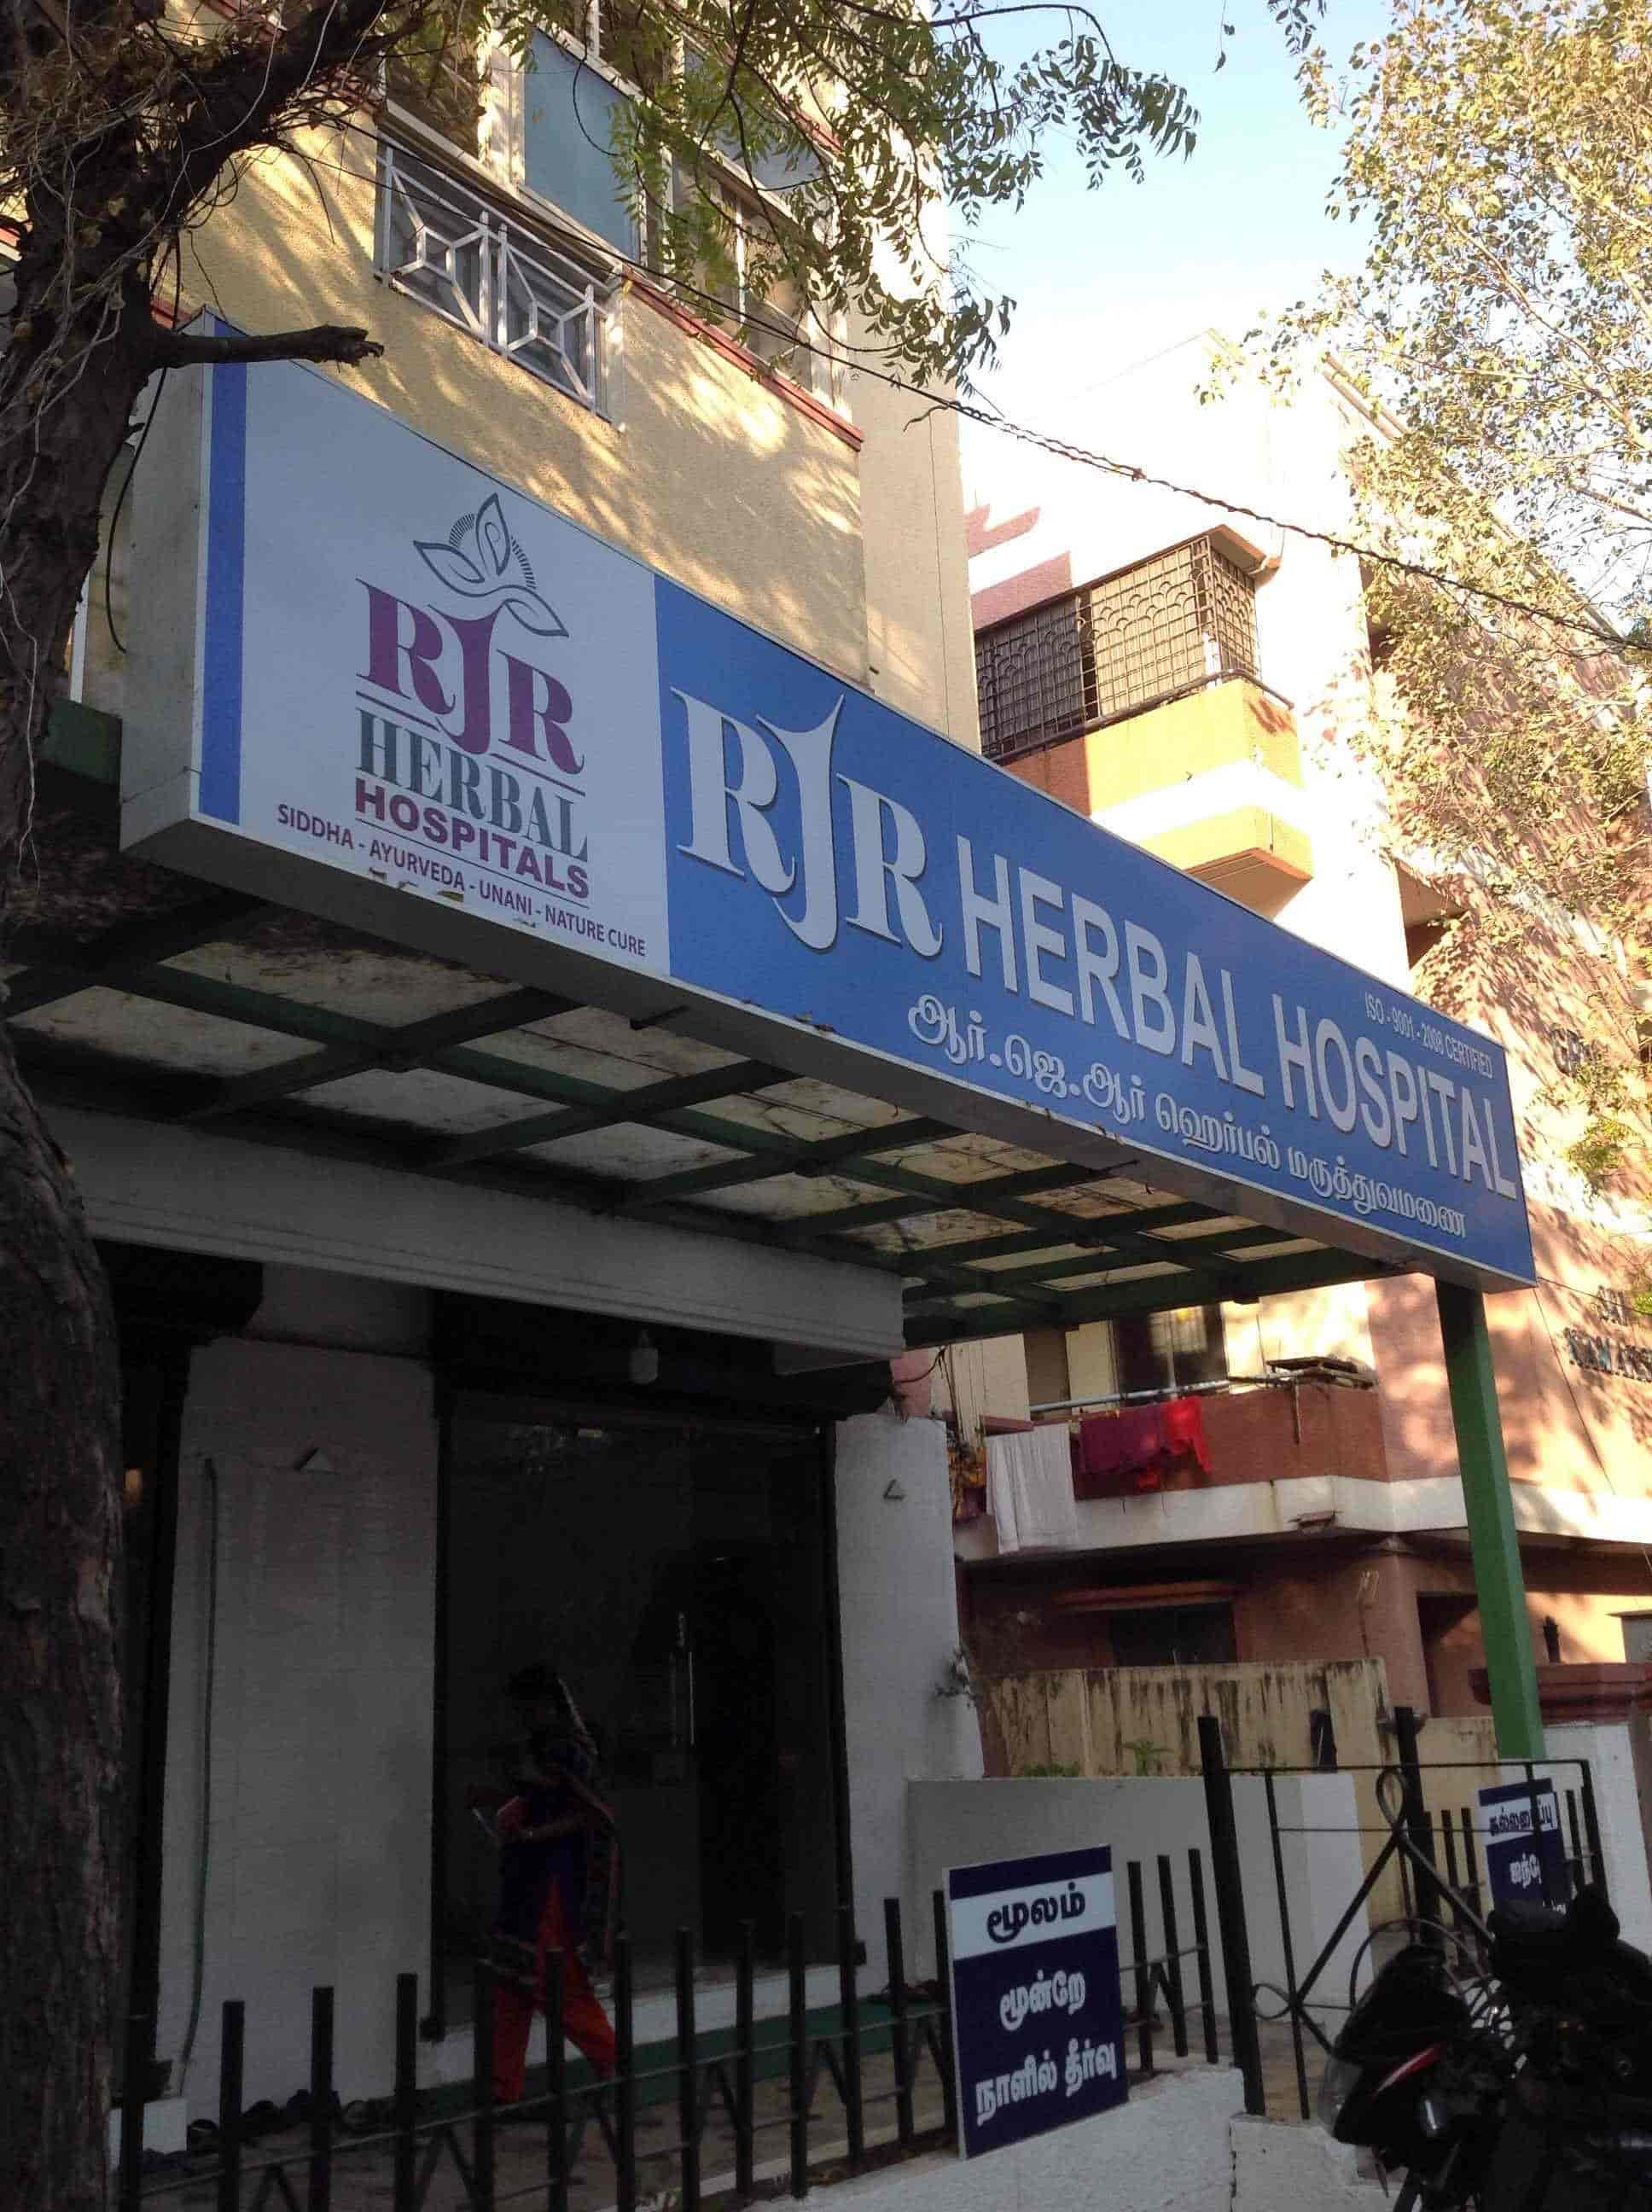 RJR Herbal Ayurveda Siddha Hospitals, Madurai Road - Hospitals in